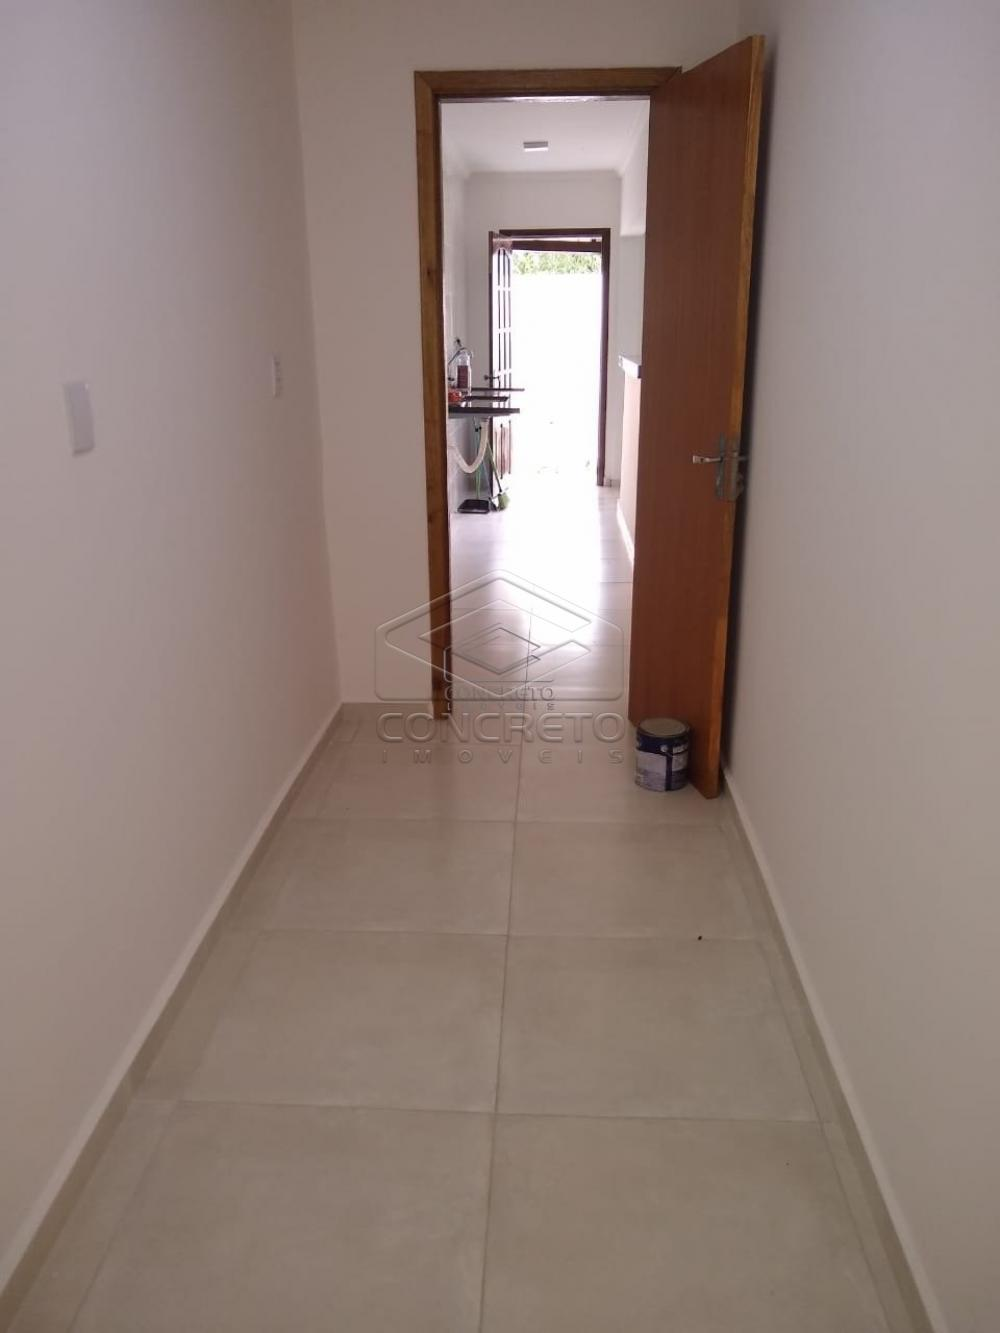 Comprar Casa / Condomínio em Bauru R$ 280.000,00 - Foto 28